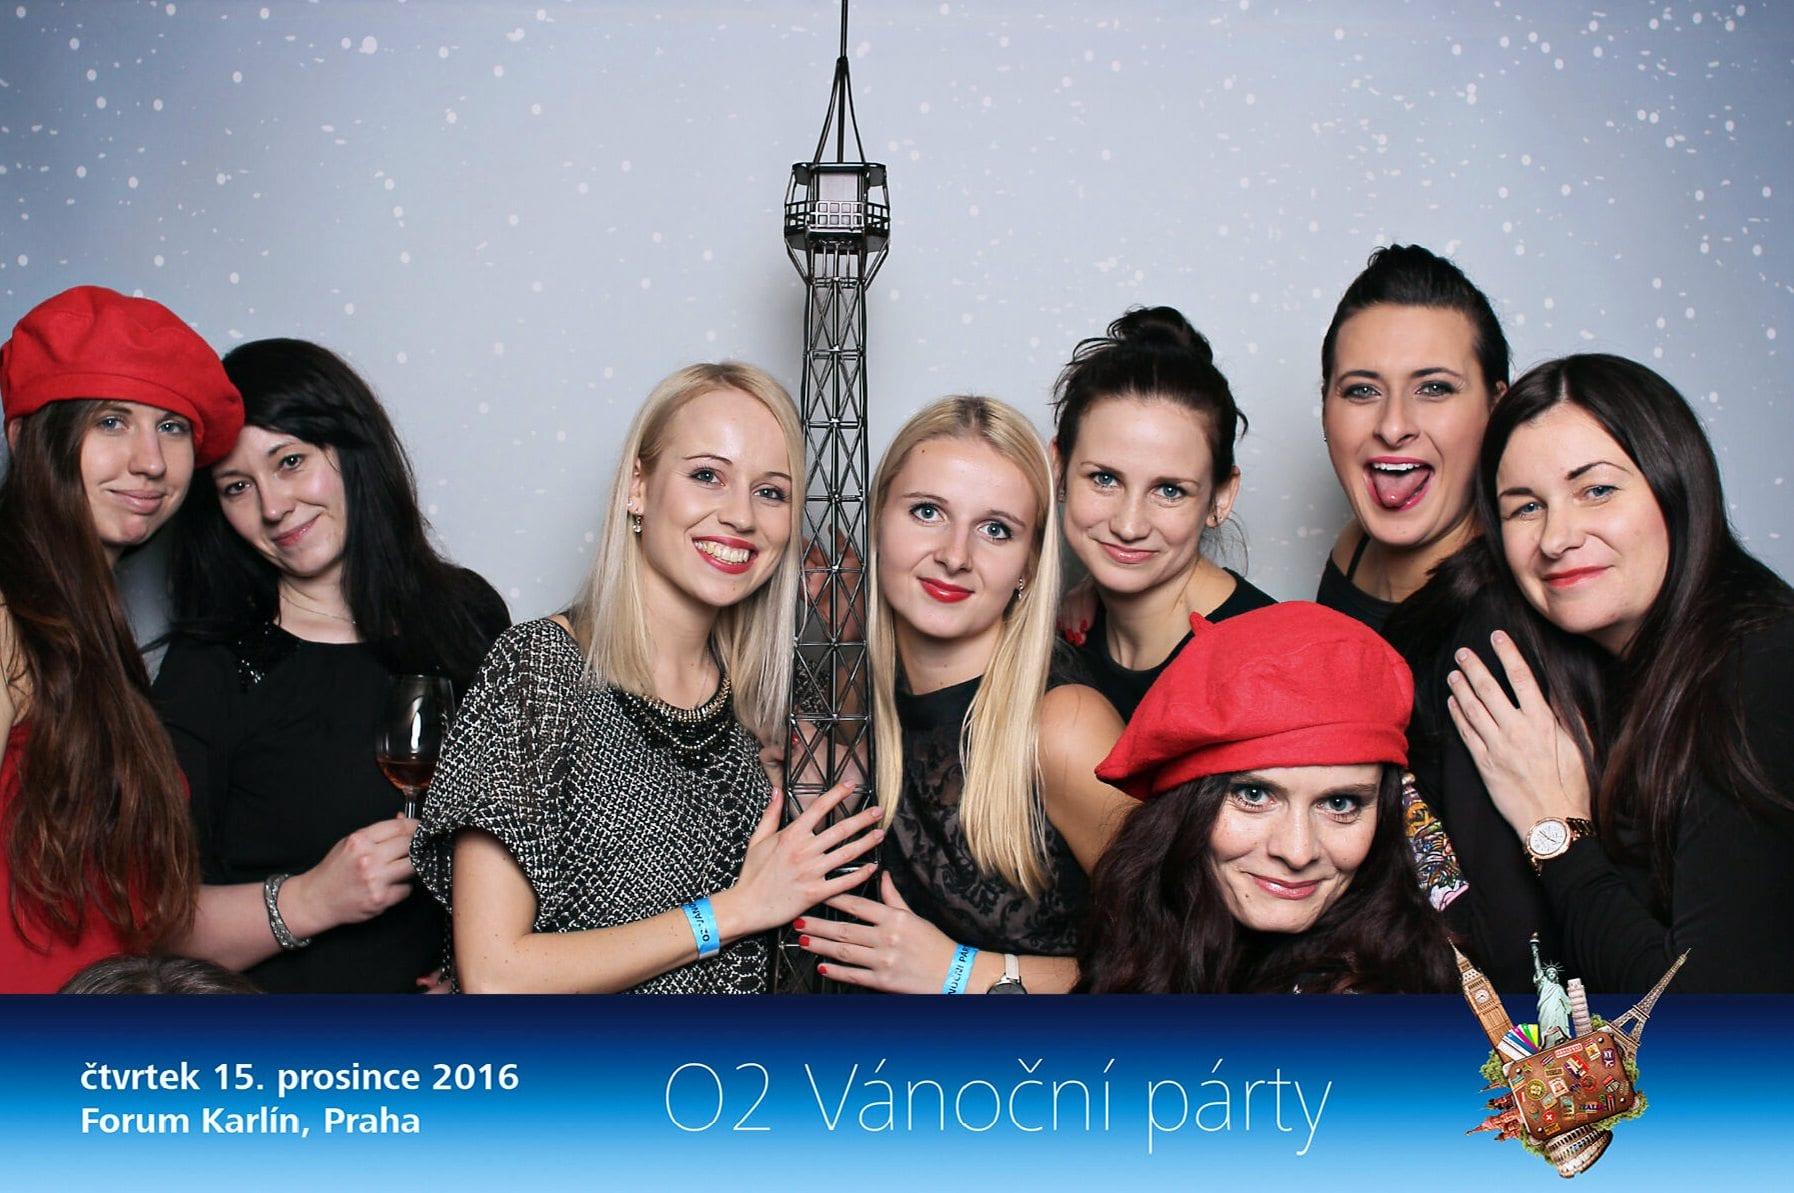 fotokoutek-02-vanocni-vecirek-cast-2-15-12-2016-188663